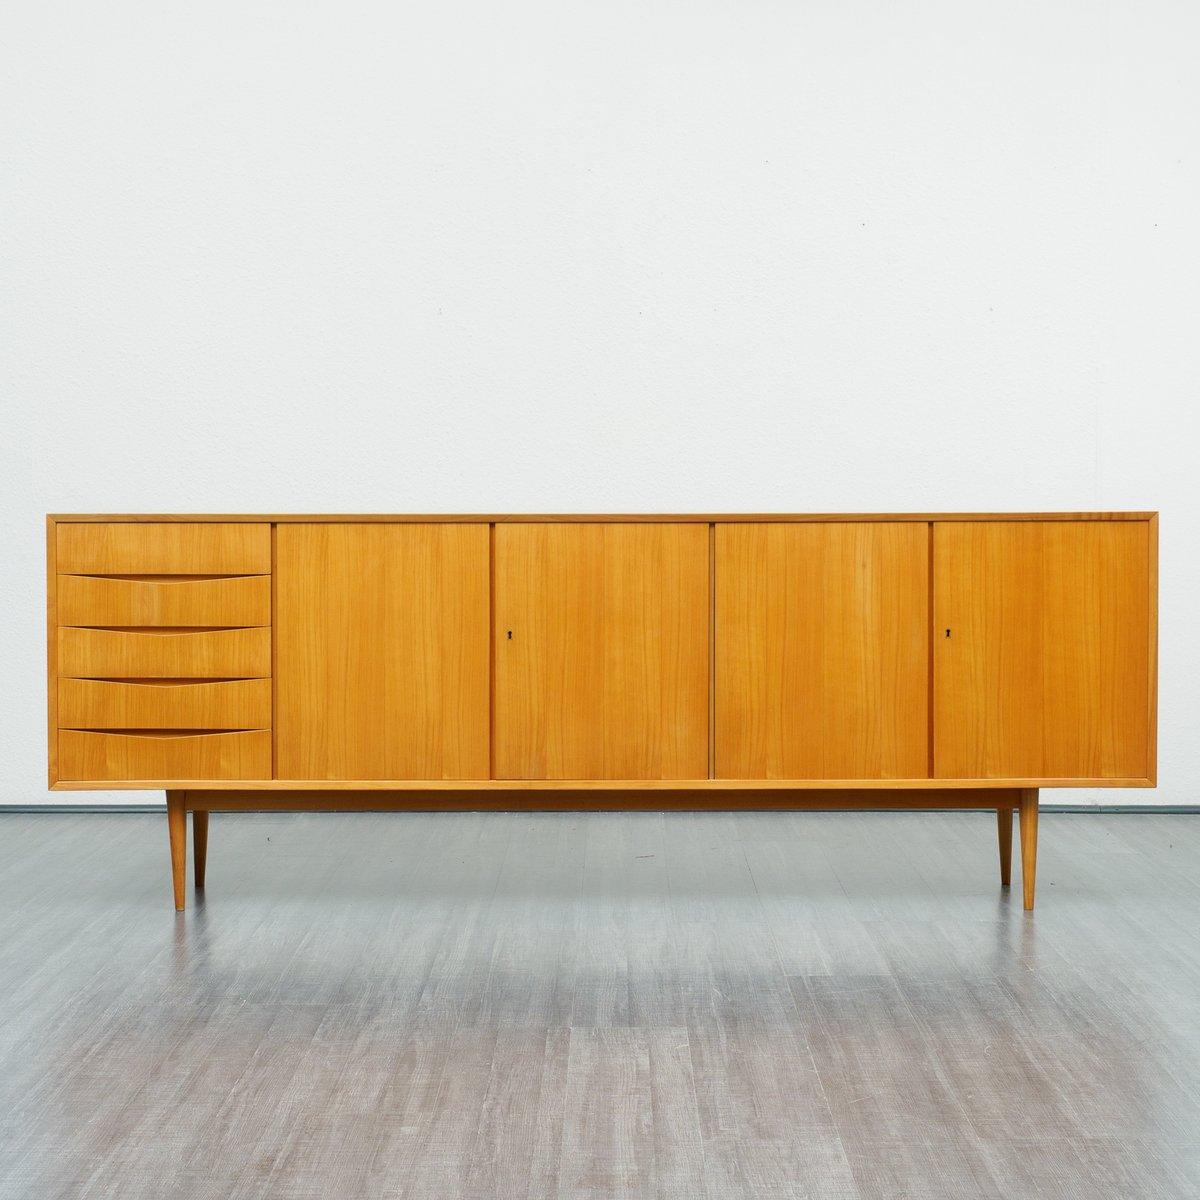 gro es sideboard aus kirschholz 1960er bei pamono kaufen. Black Bedroom Furniture Sets. Home Design Ideas